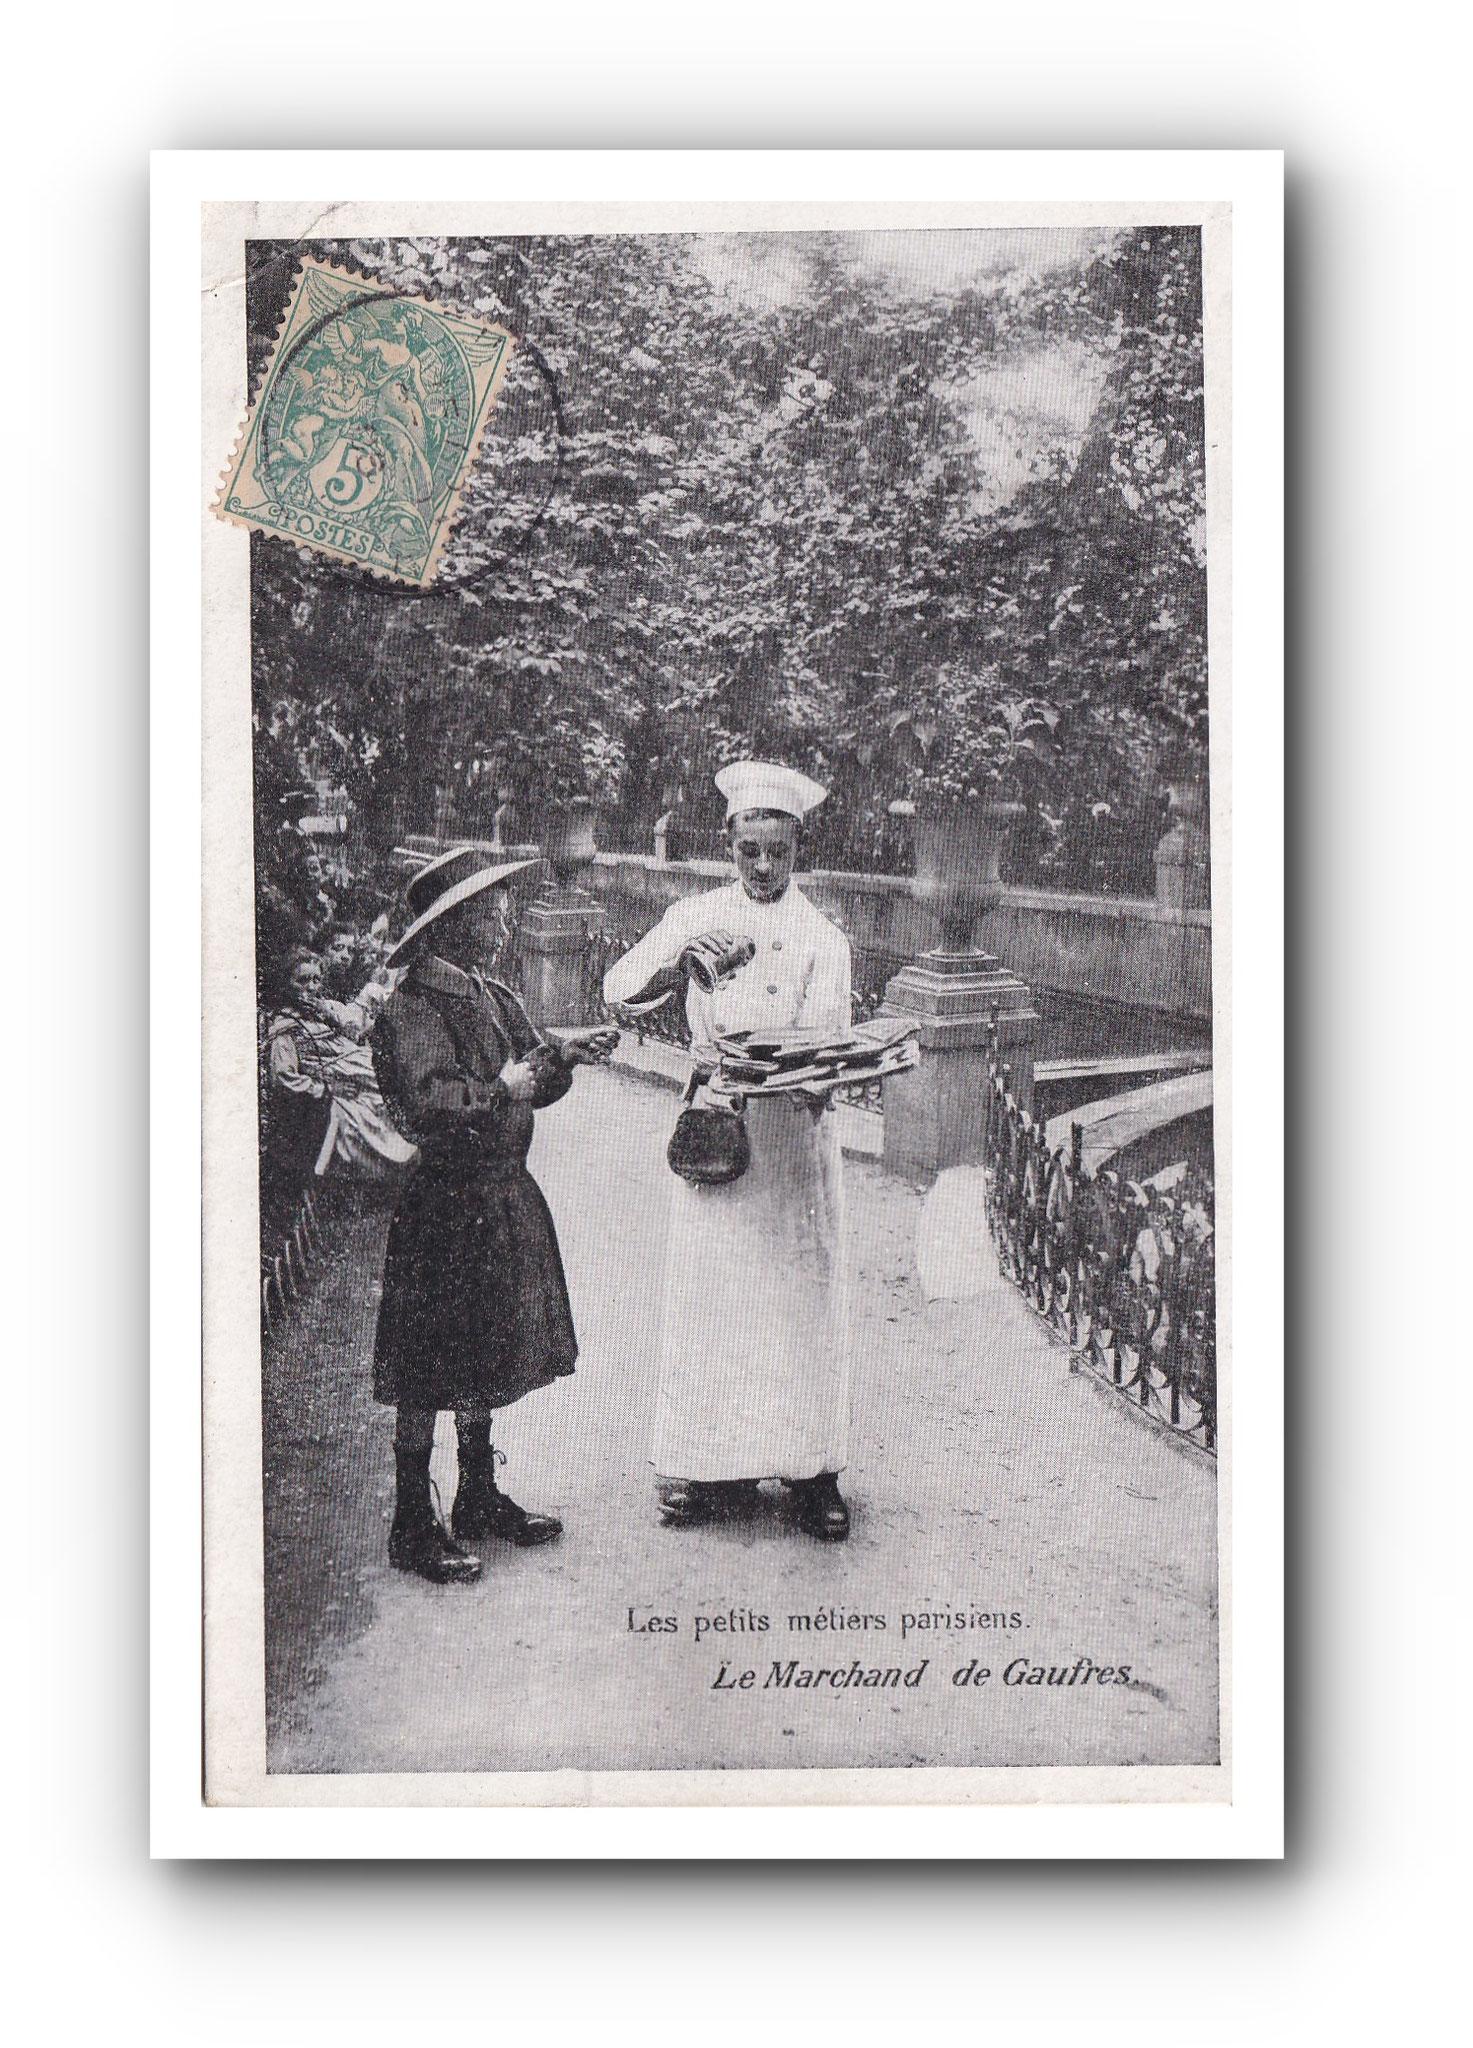 Le marchand de Gaufres - PARIS - 1904 - Der Waffelverkäufer - The wafer seller